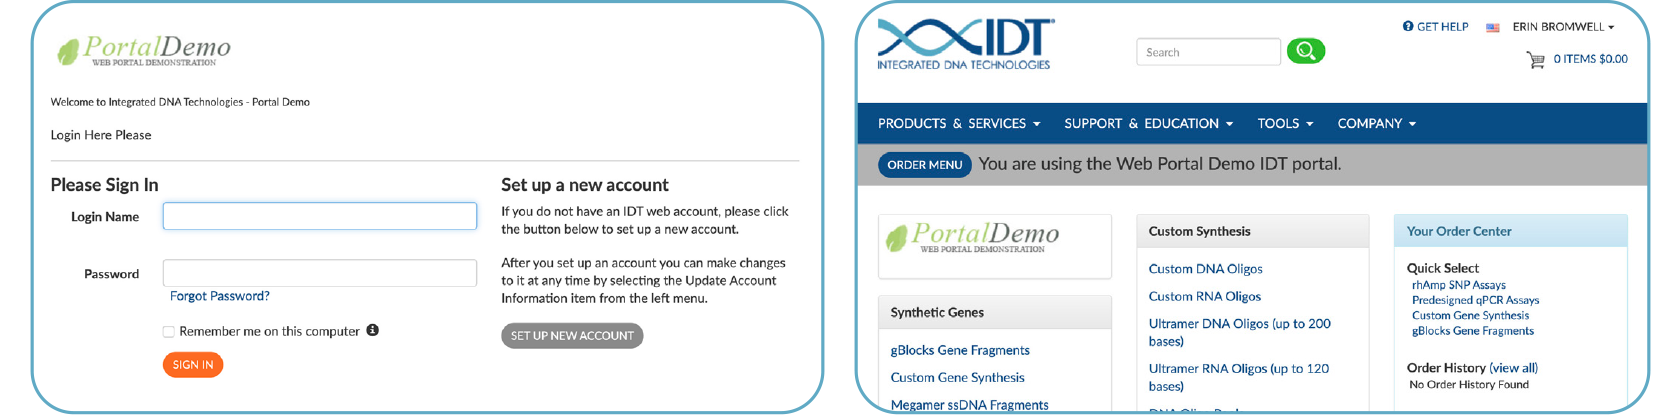 Examples of IDT API portal configurations